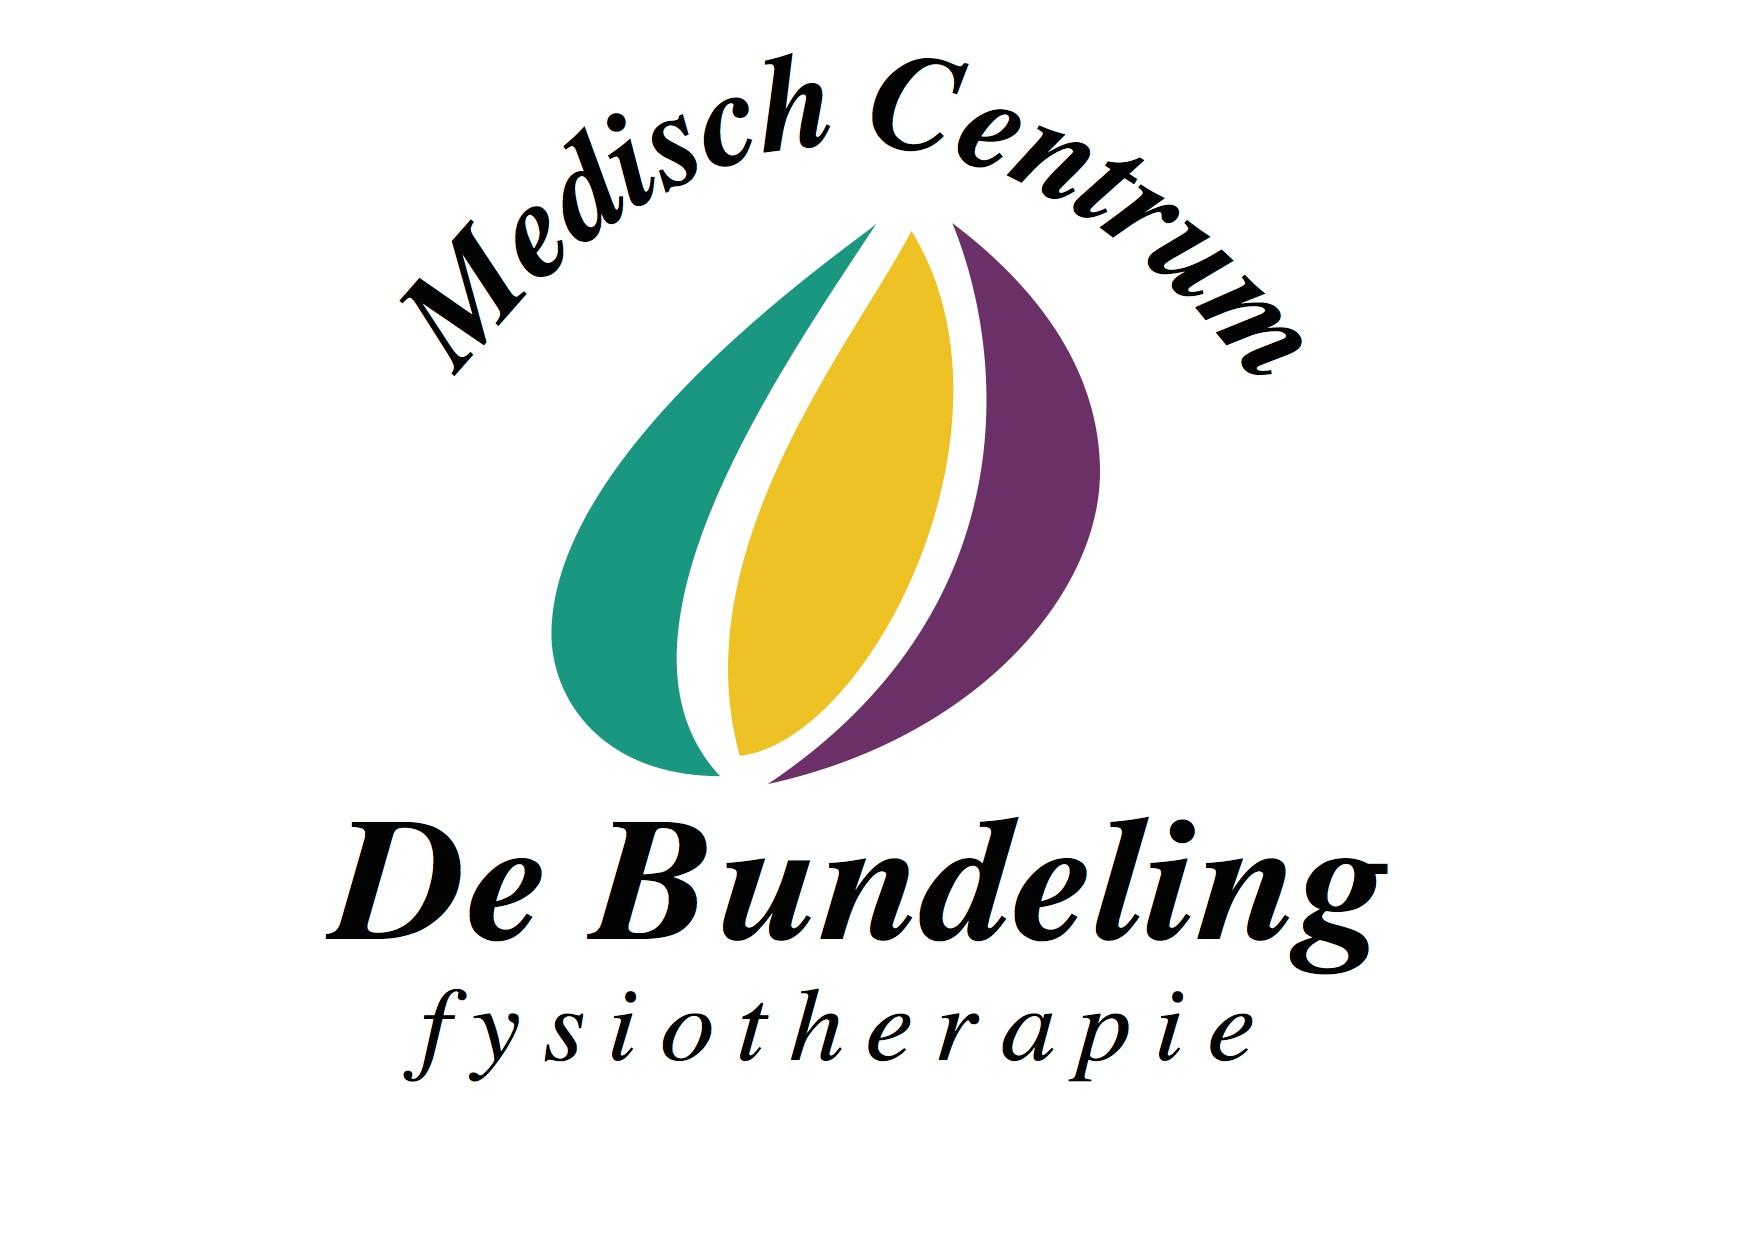 Fysiotherapie de Bundeling